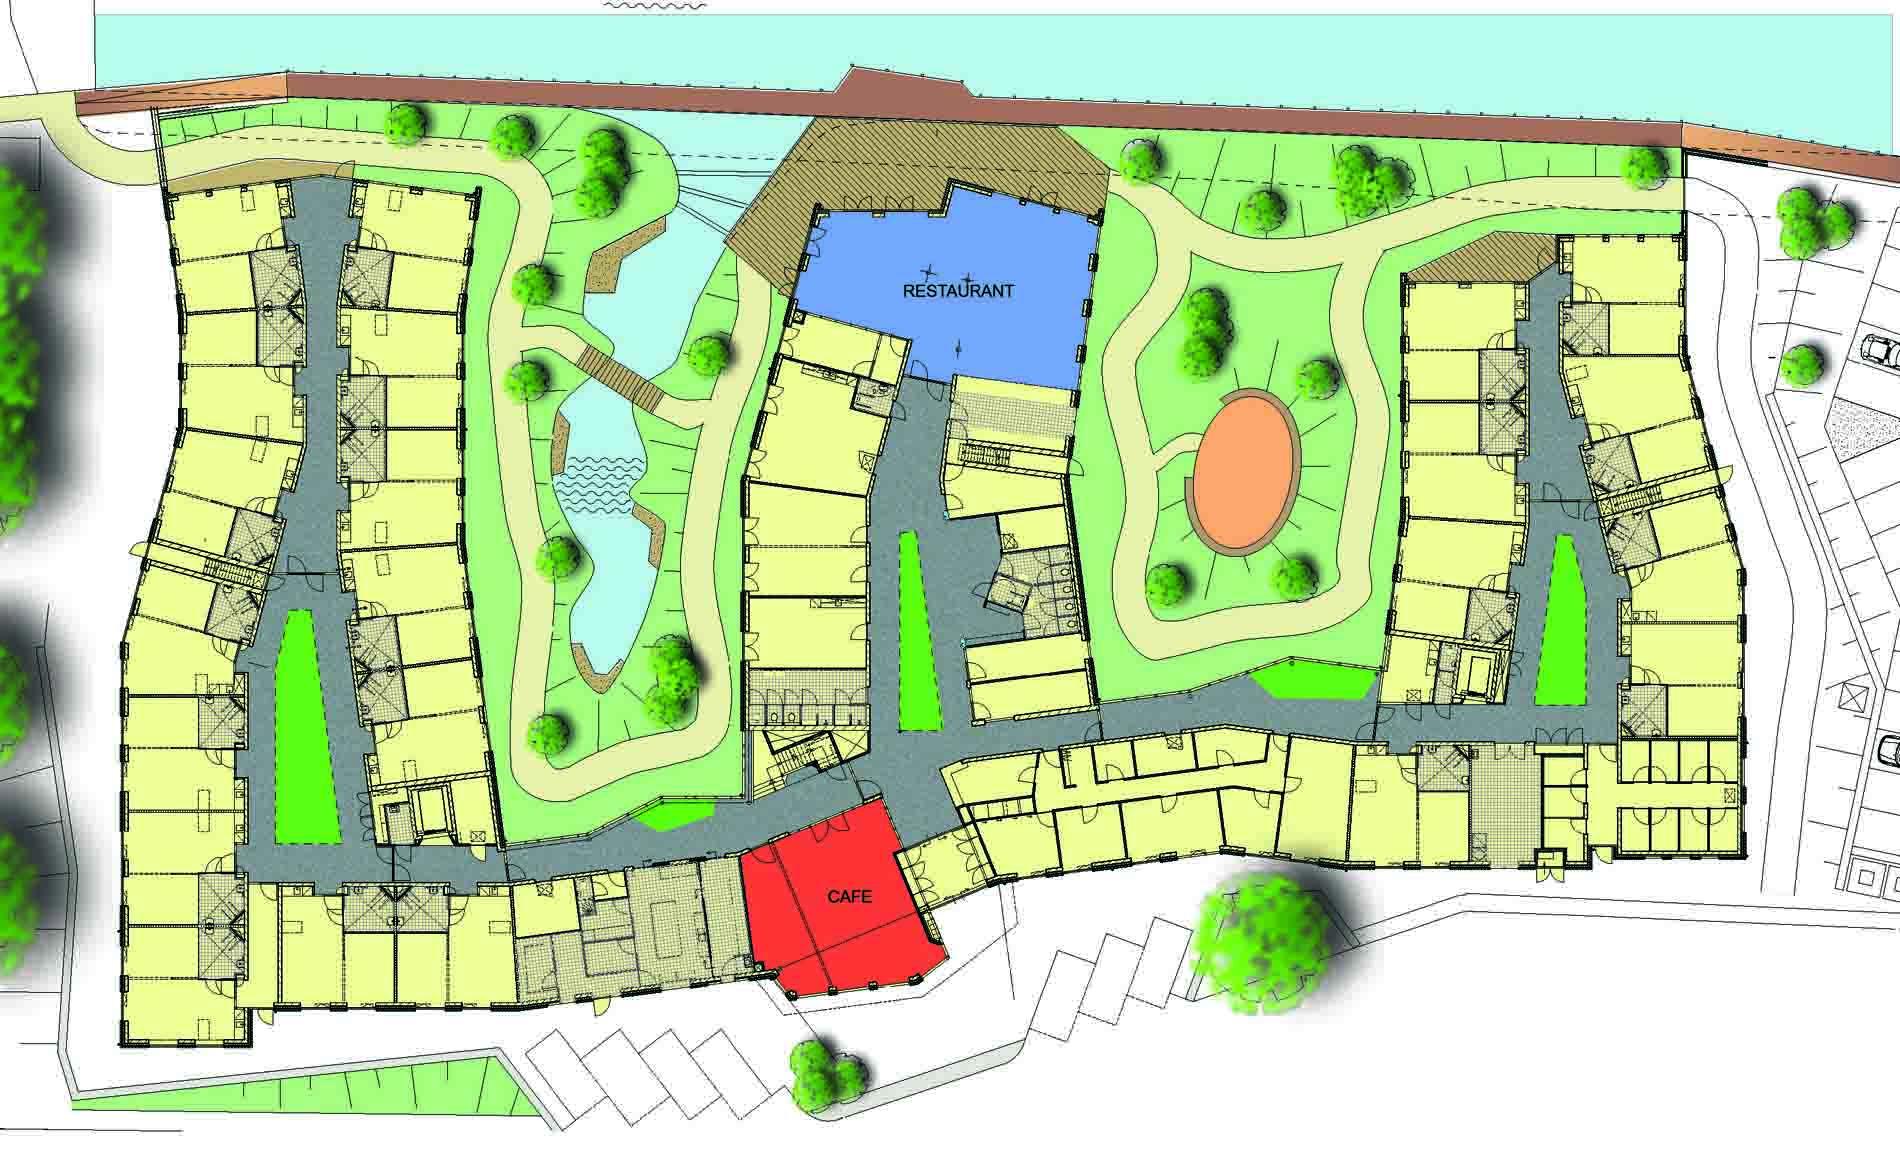 architect zorg seniorenhuisvesting woonzorgcentrum woonzorggebouw Den Helder Groene Vecht Tellus